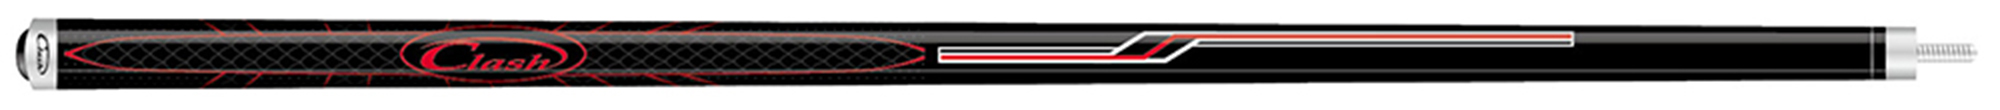 PK0646-6: Clash Nano 4 rood 12,75mm #1